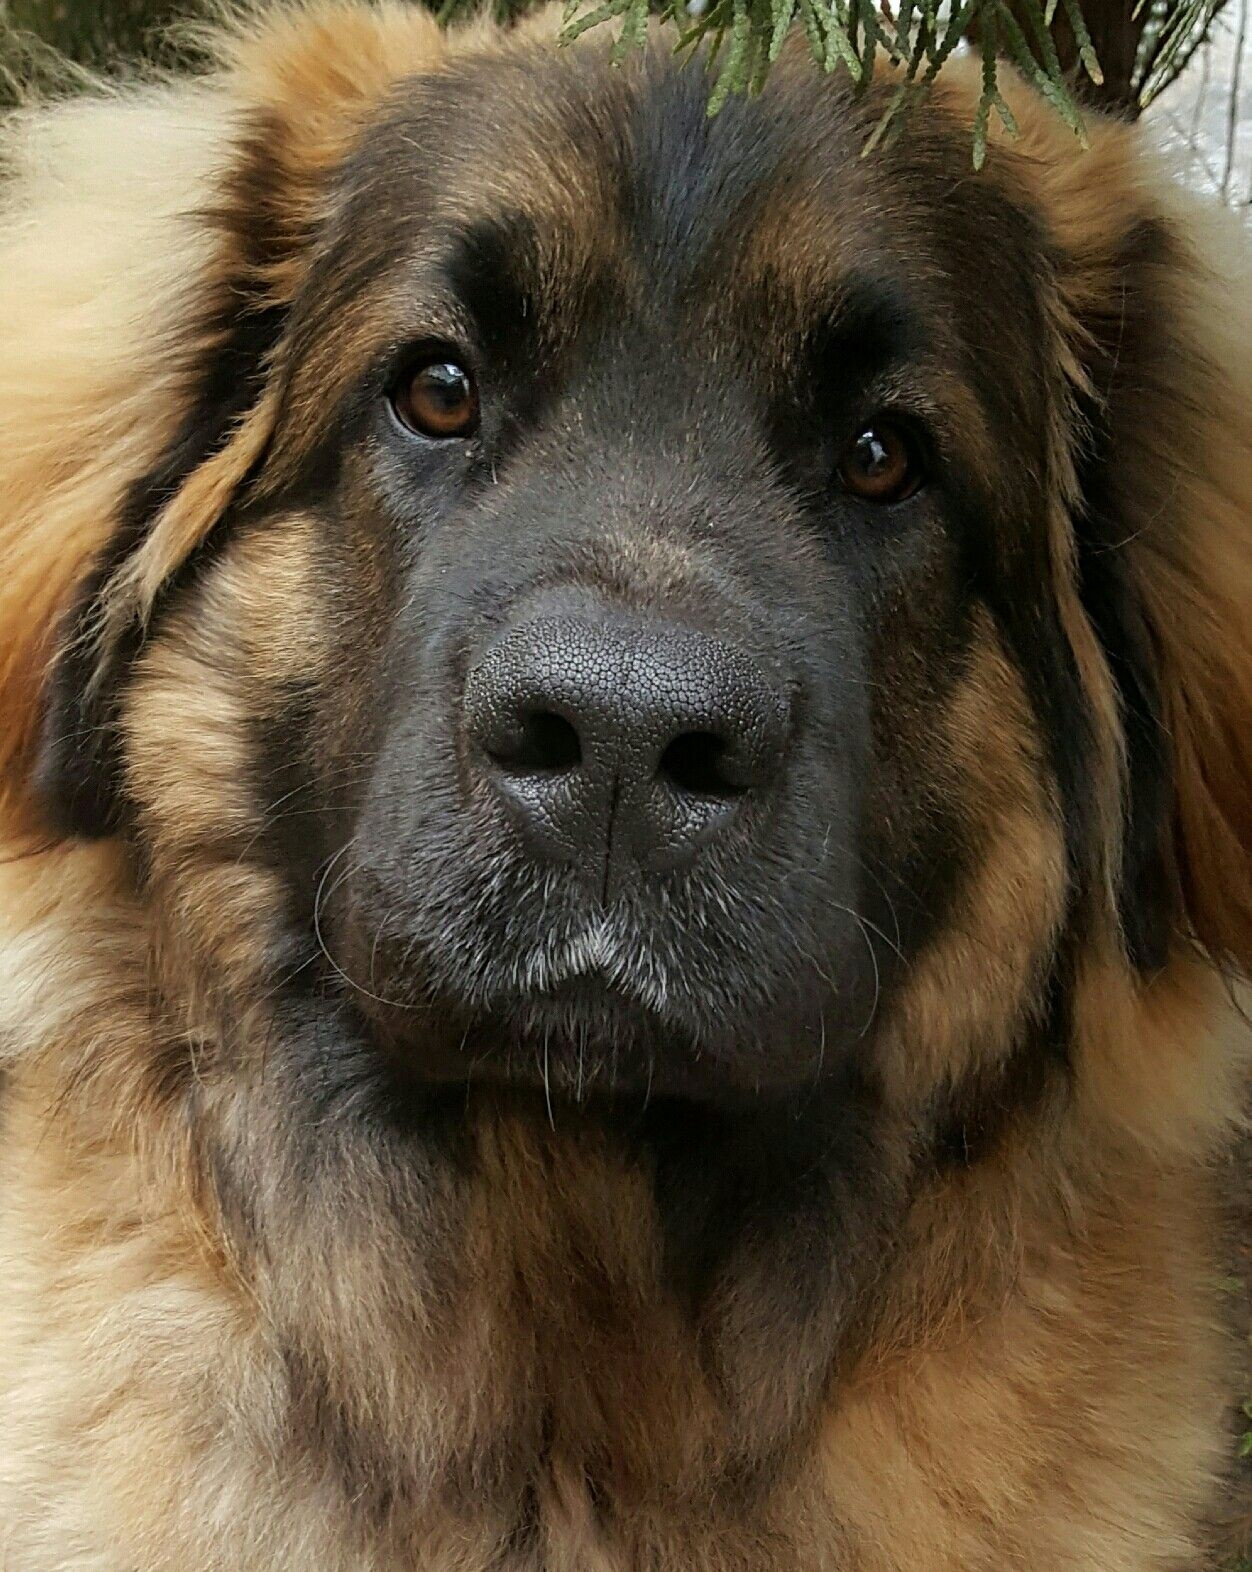 Pin By Karsta On Leonberger Giant Dog Breeds Leonberger Dog Leonburger Dog